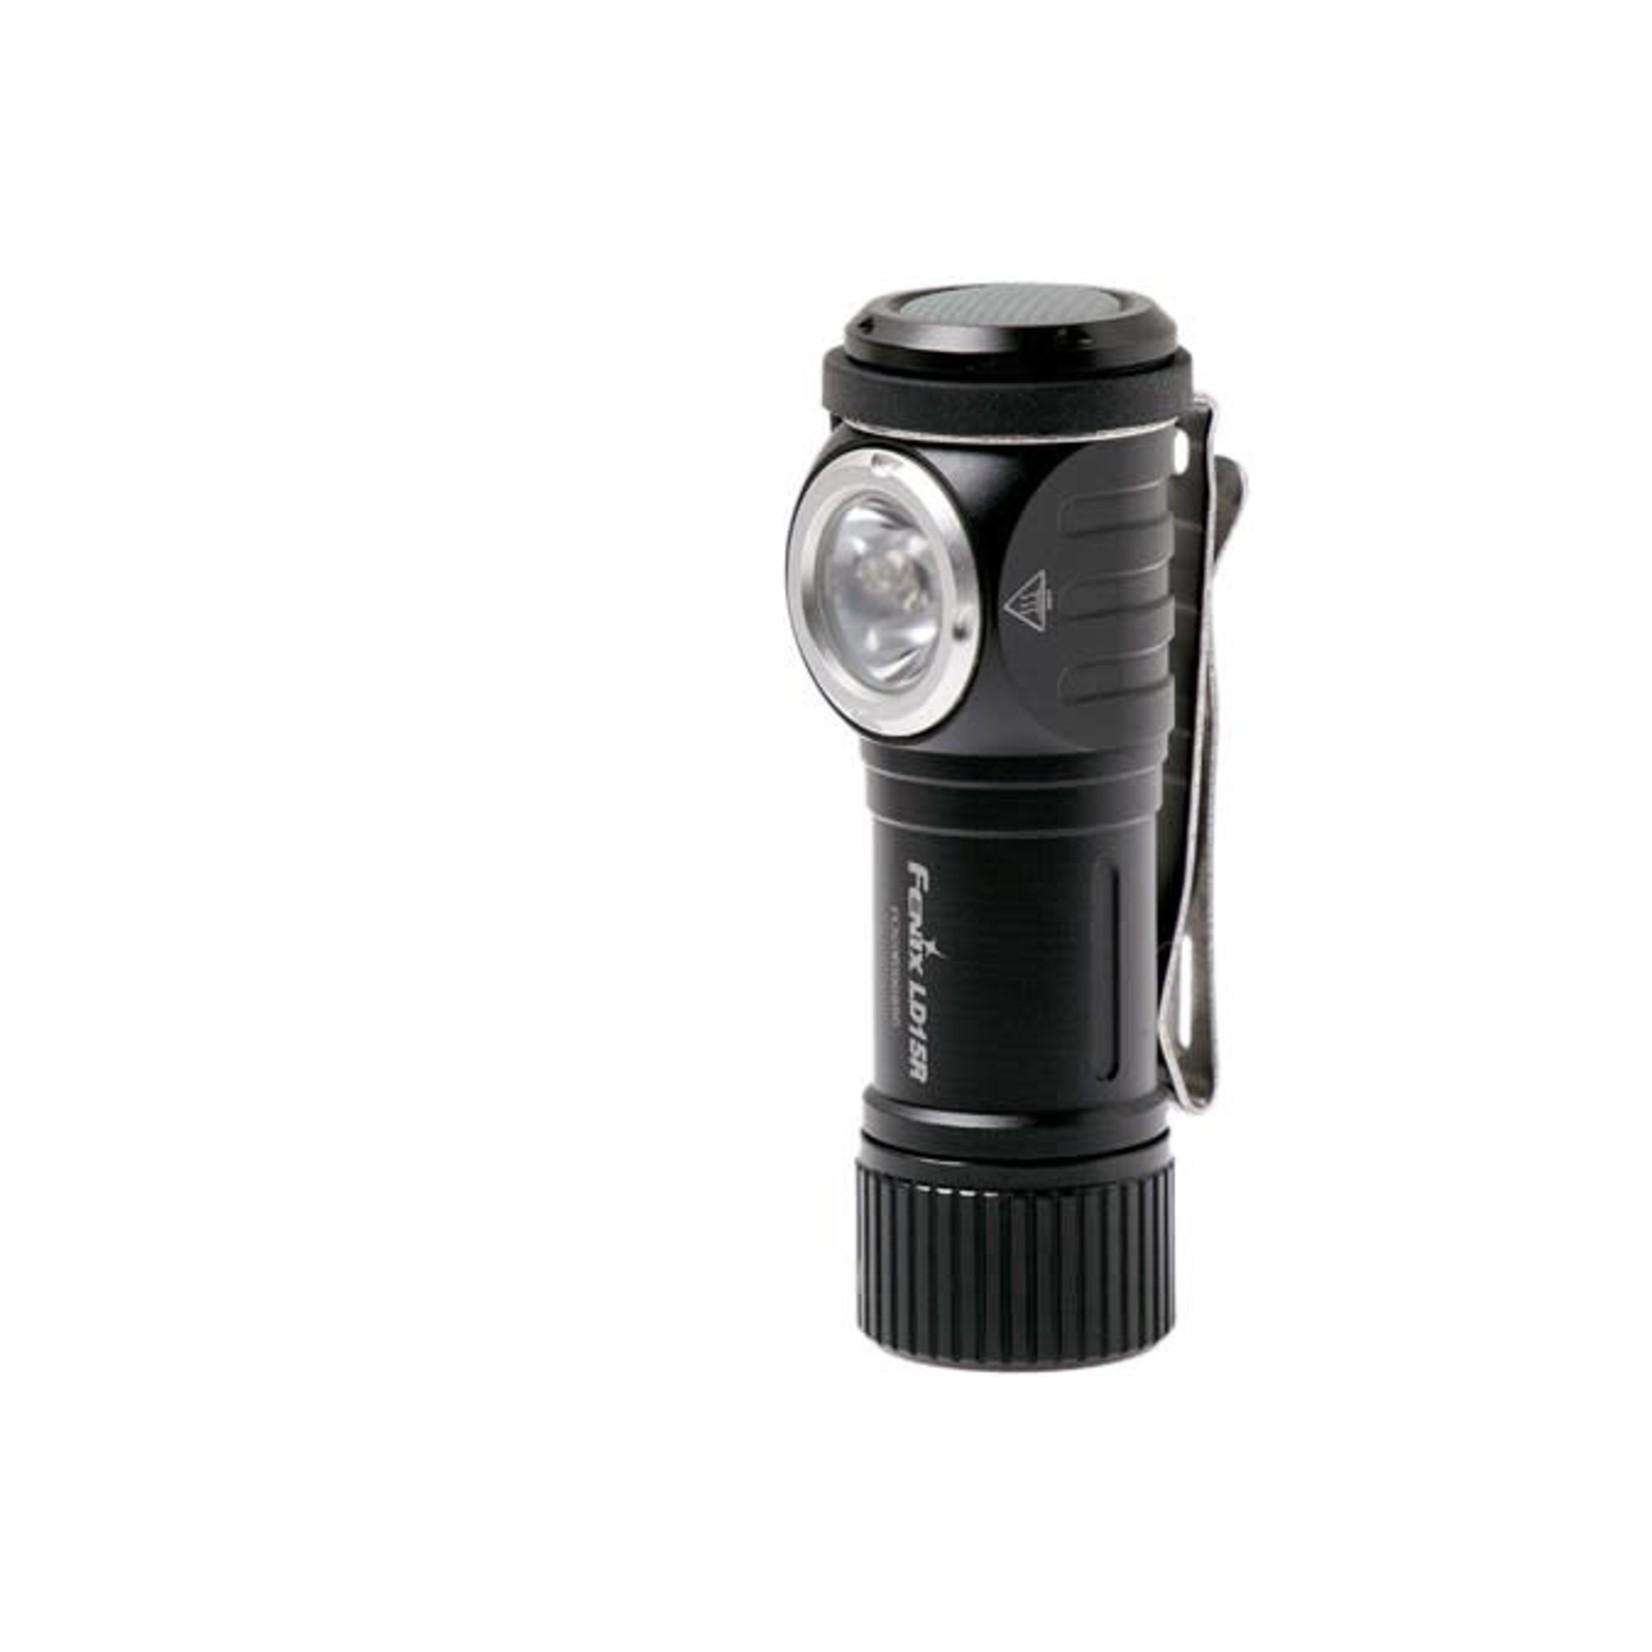 Fenix Fenix LD15R Flashlight